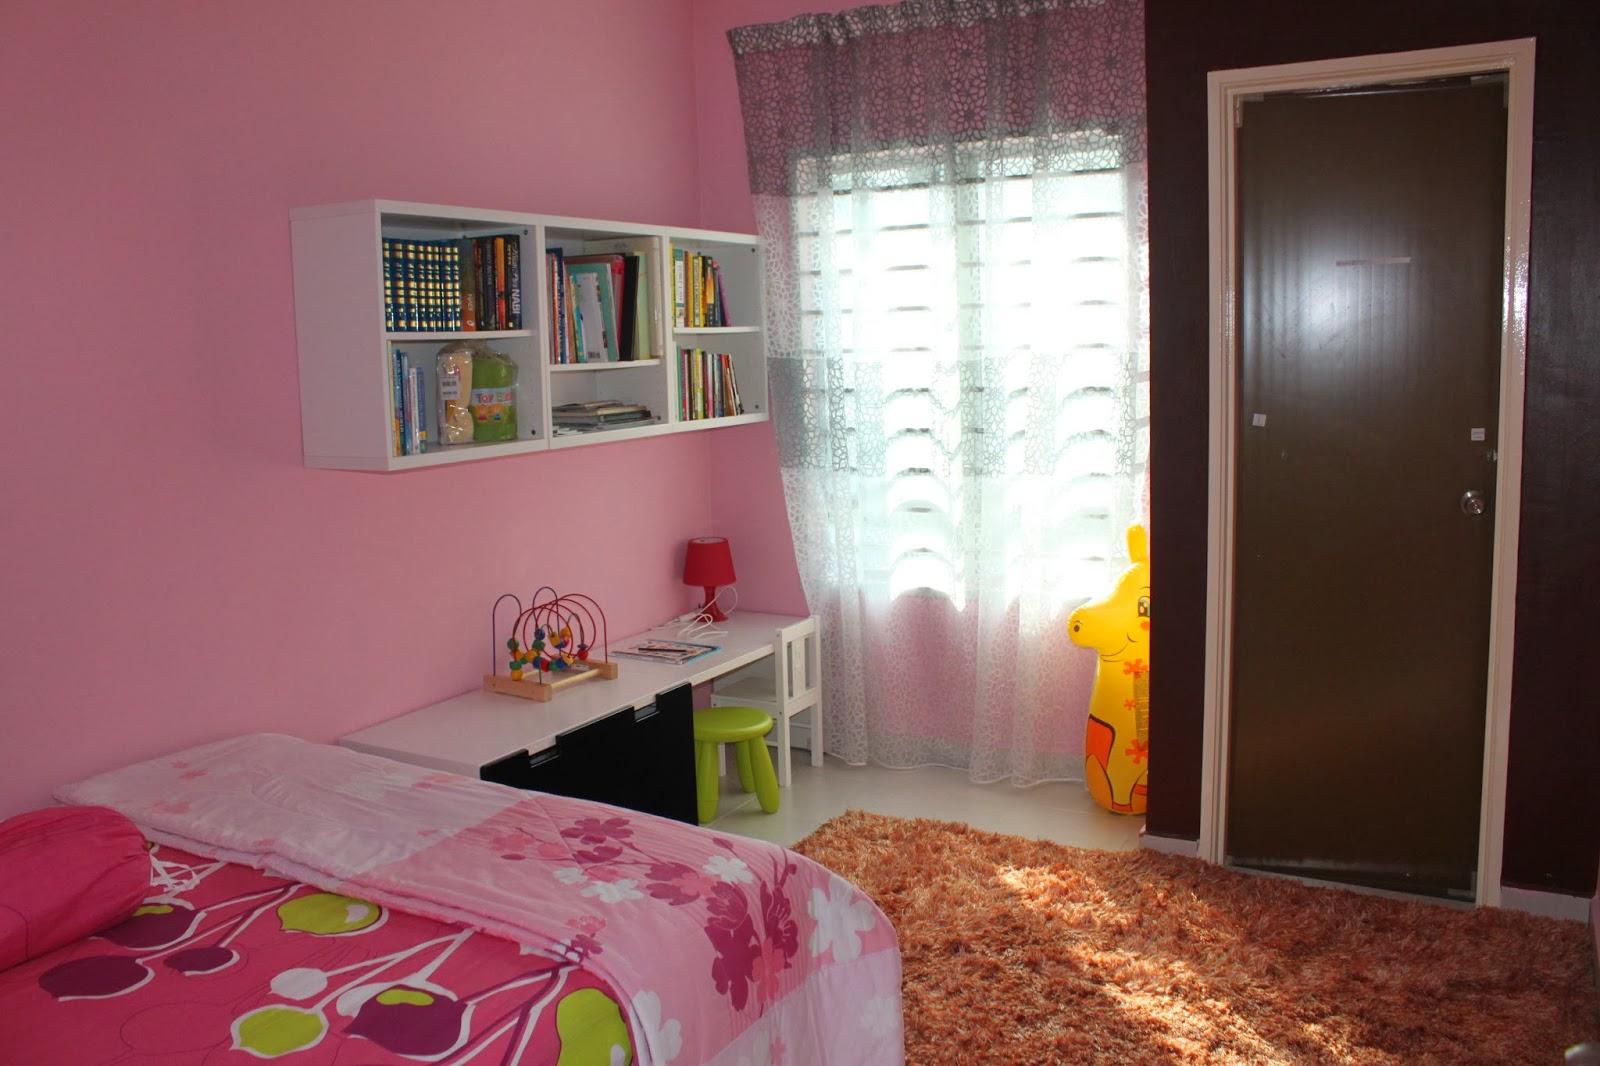 Dekorasi Yang Simple Untuk Bedroom My Baby Girlz Nuha Safiya... Barang2  Tersebut Kitorang Beli Di IKEA. Kos Rak Buku, Lampu Meja, Kerusi, Meja  Study, ...